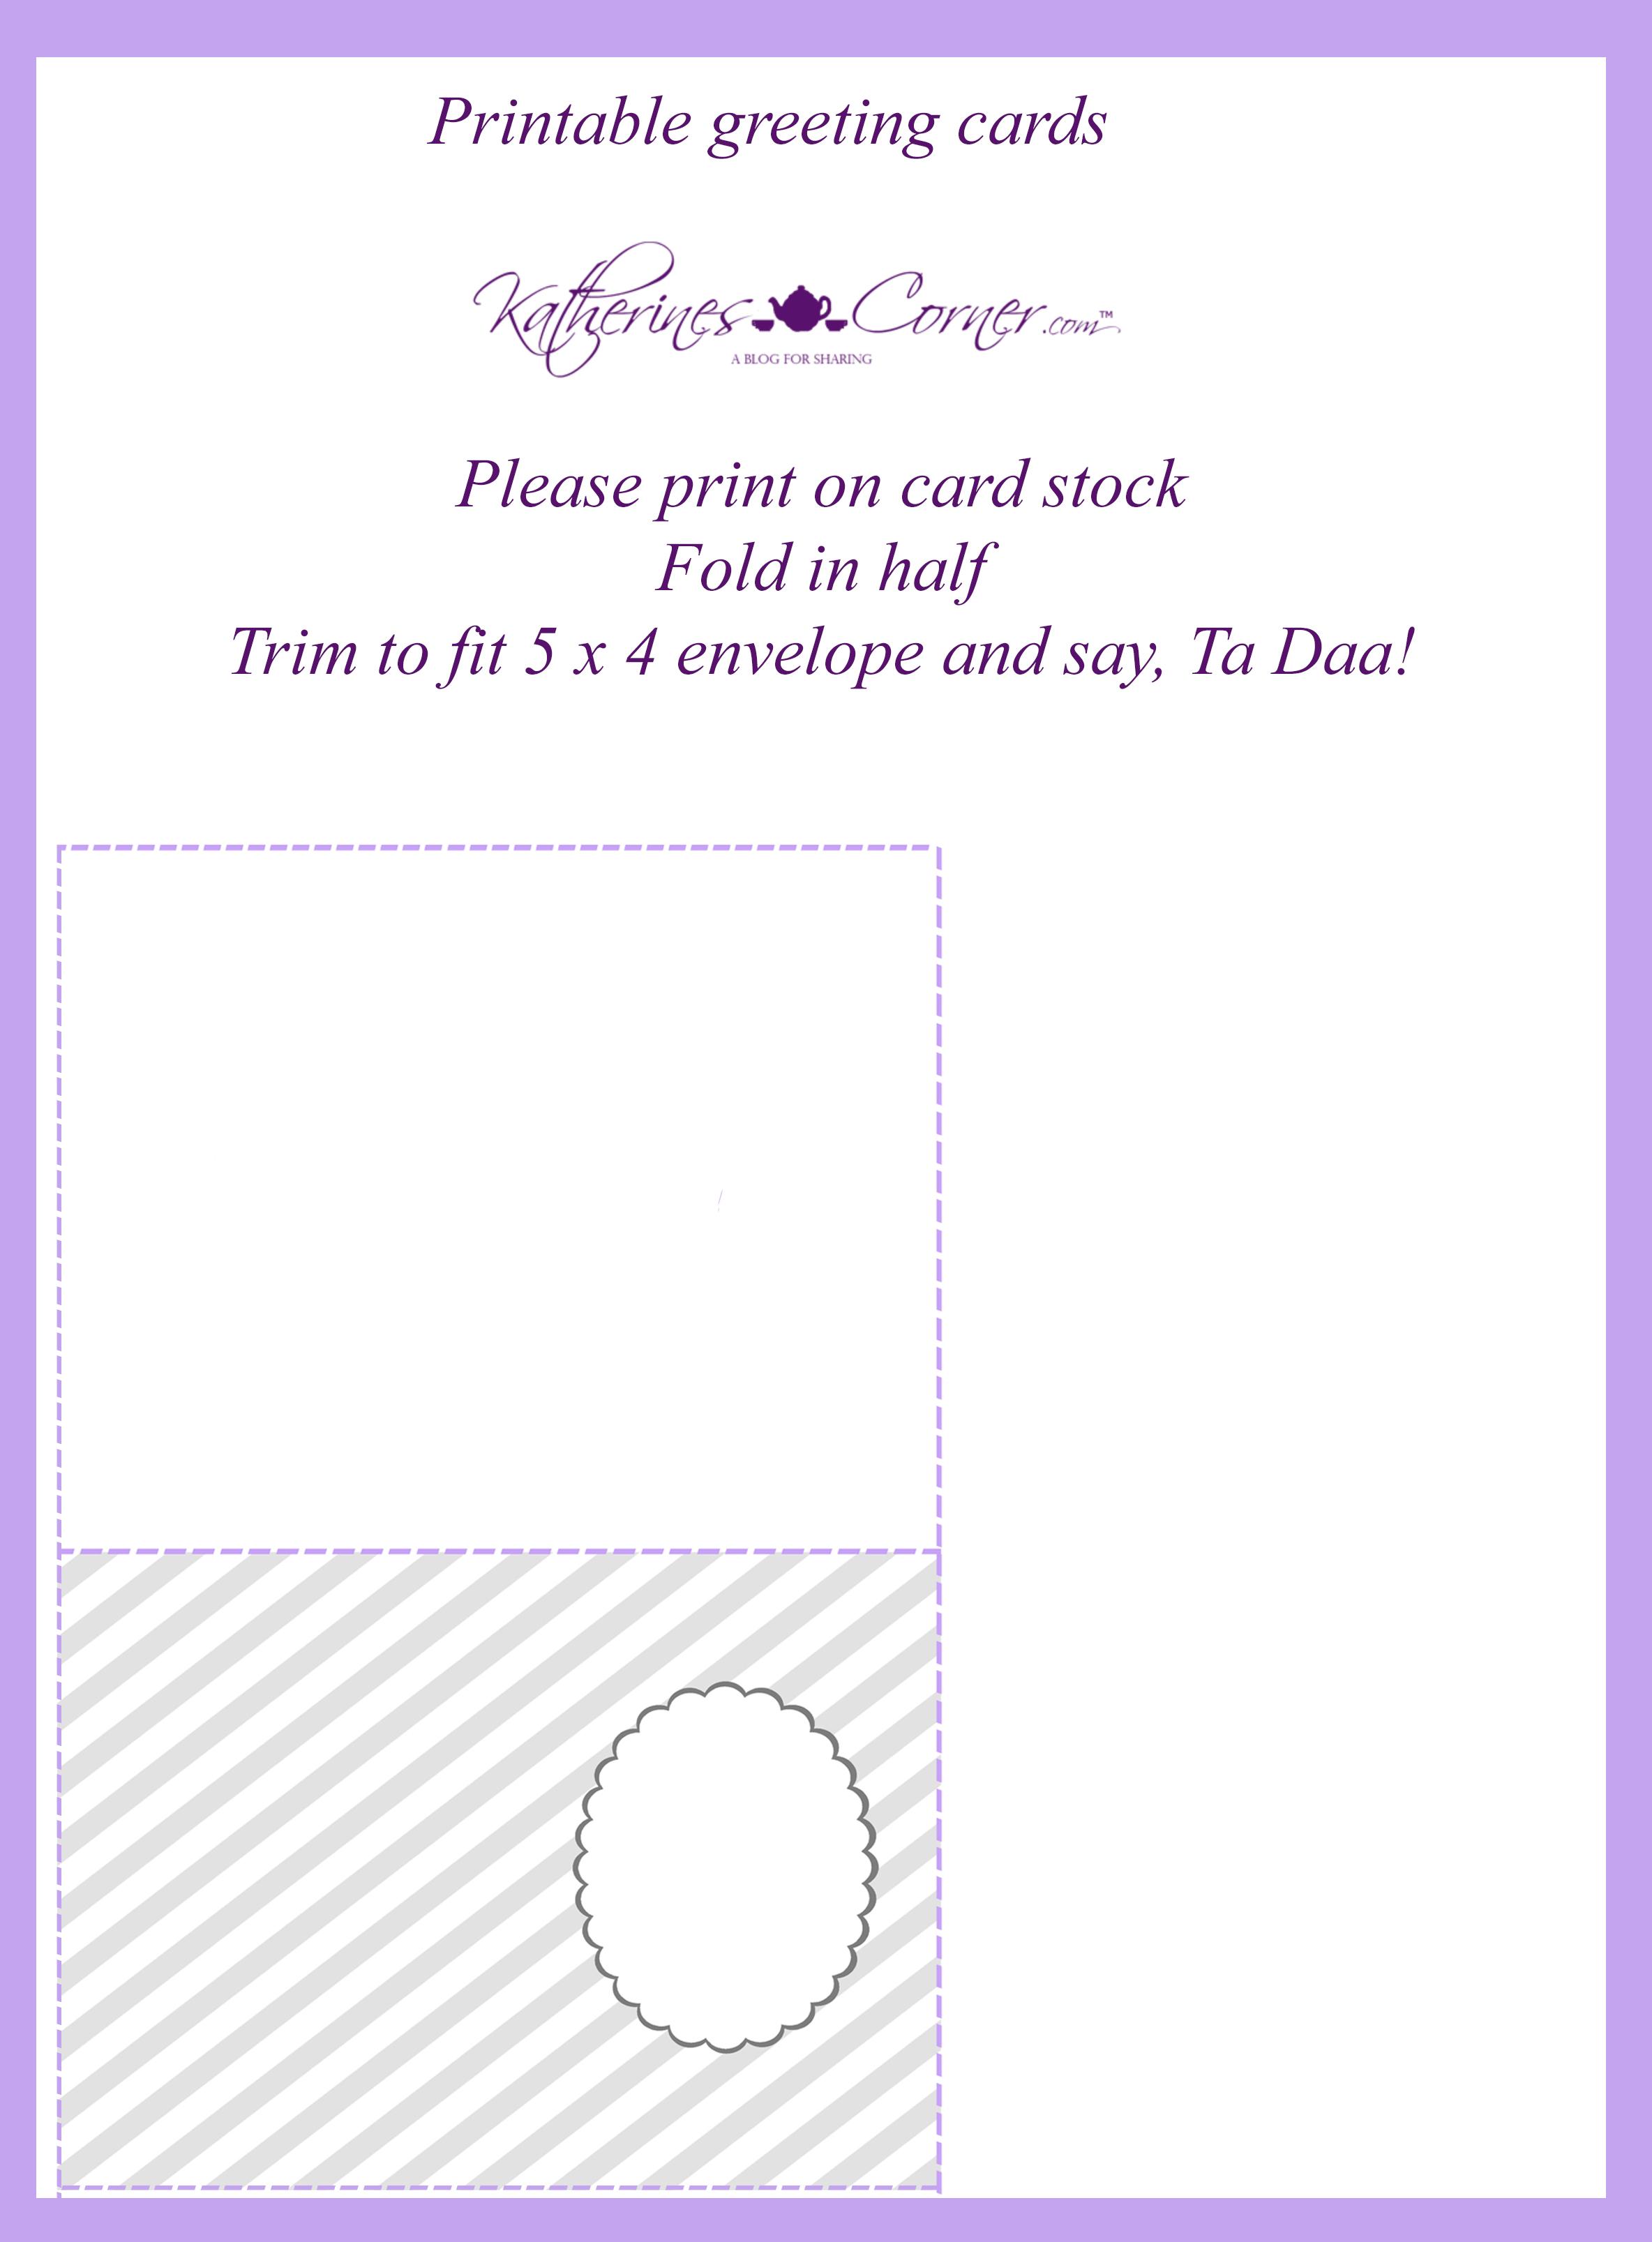 image about Printable Greeting Card Stock known as 3 Crimson Printable Greeting Playing cards - Katherines Corner